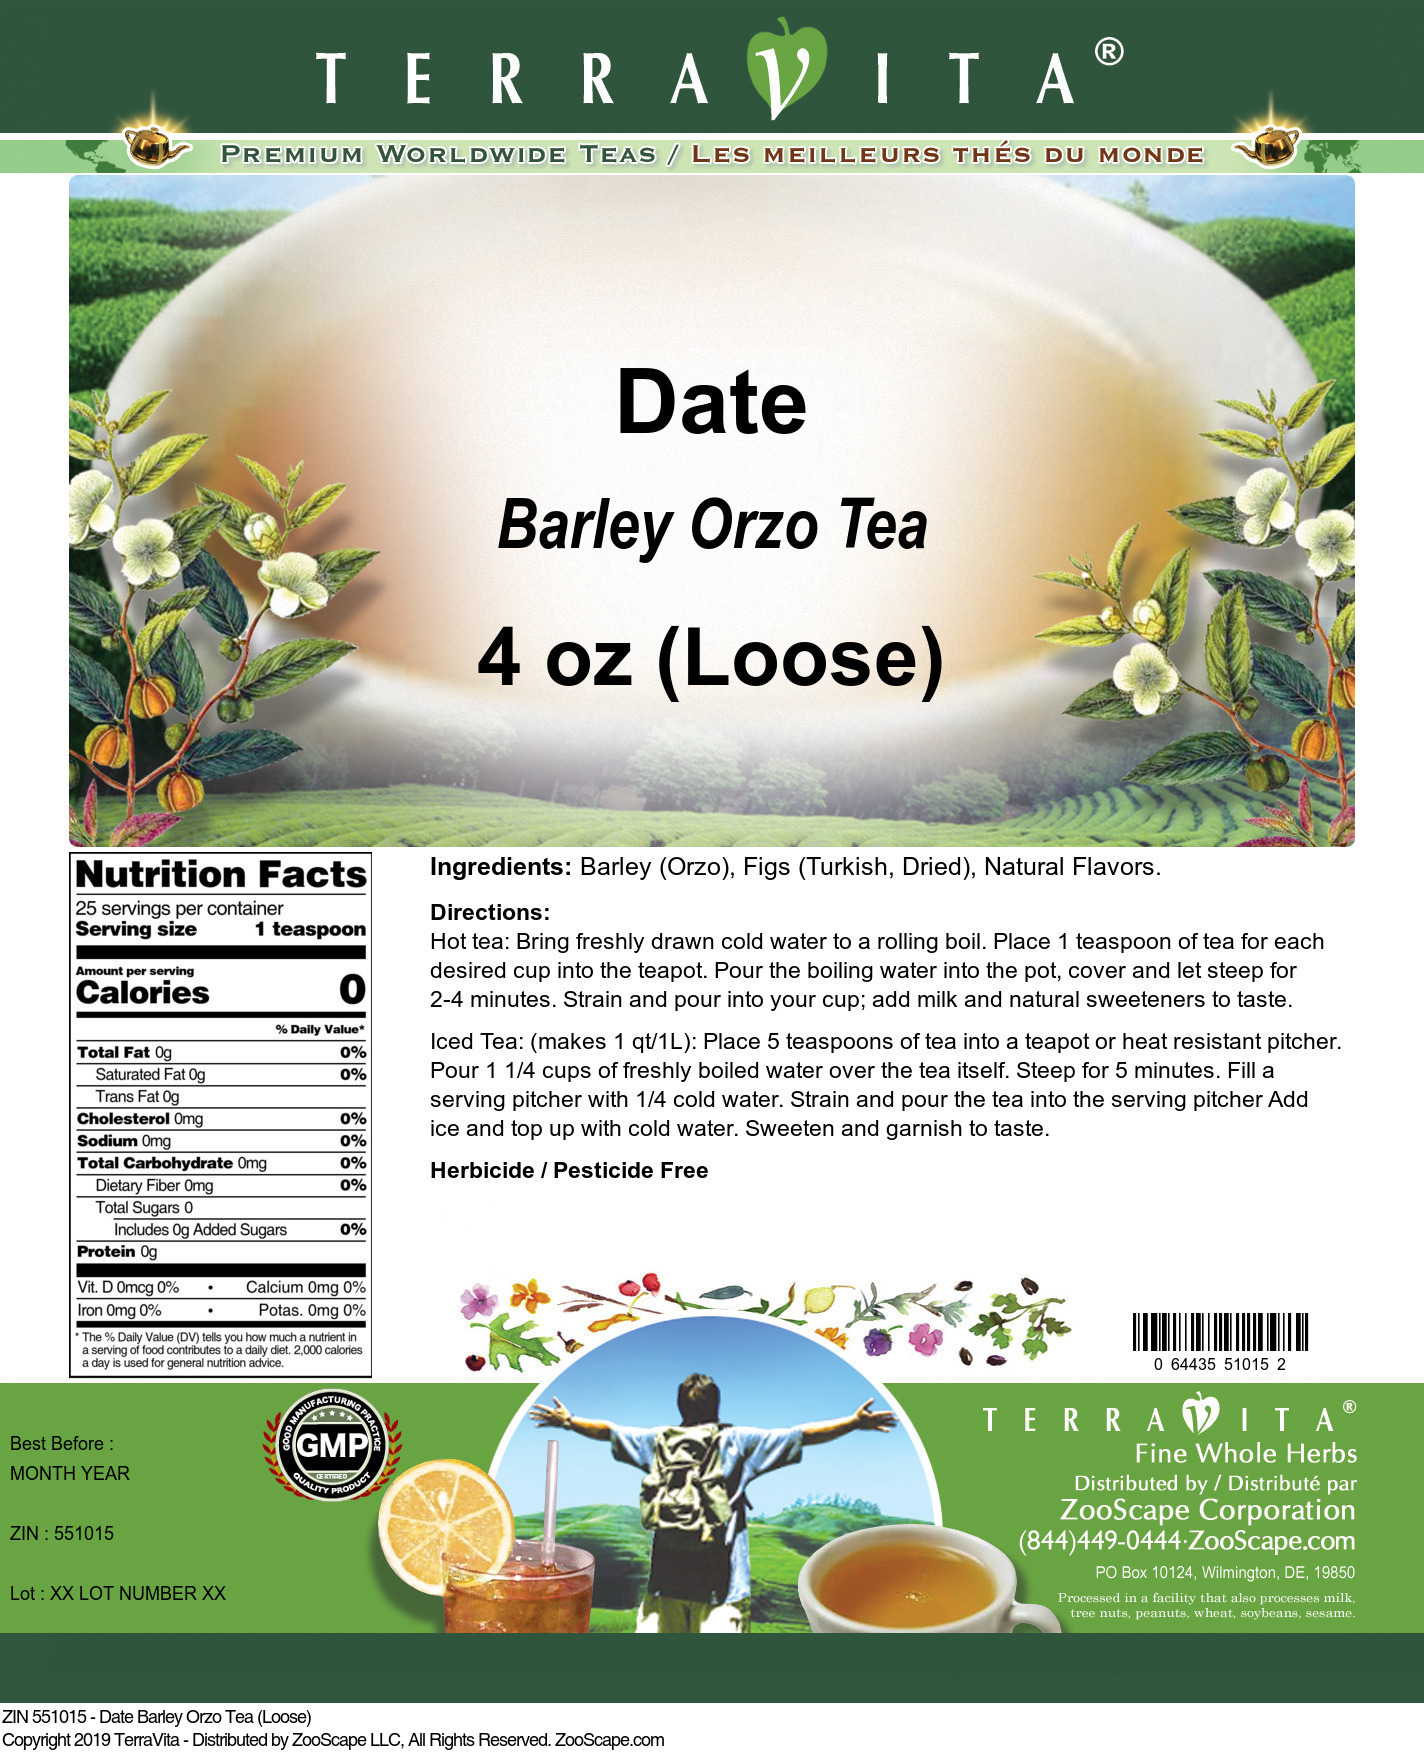 Date Barley Orzo